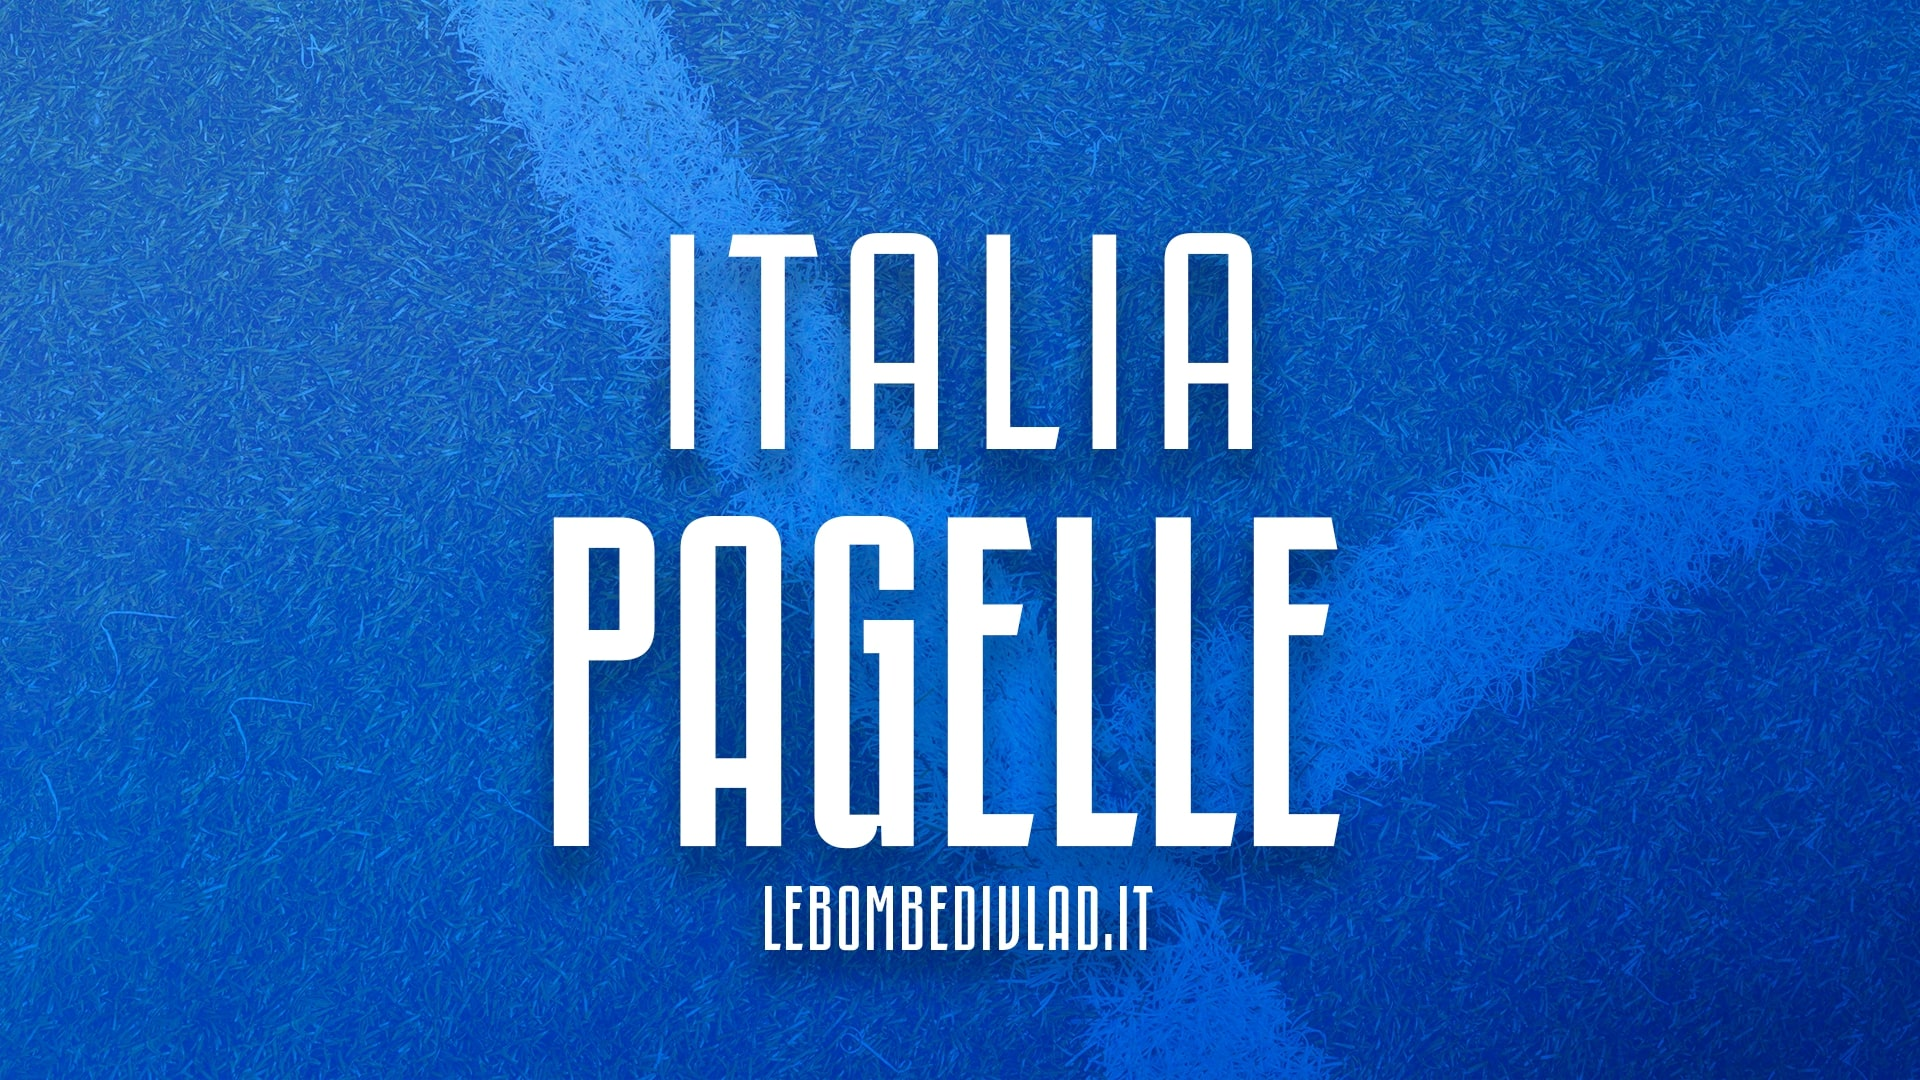 PAGELLE ITALIA